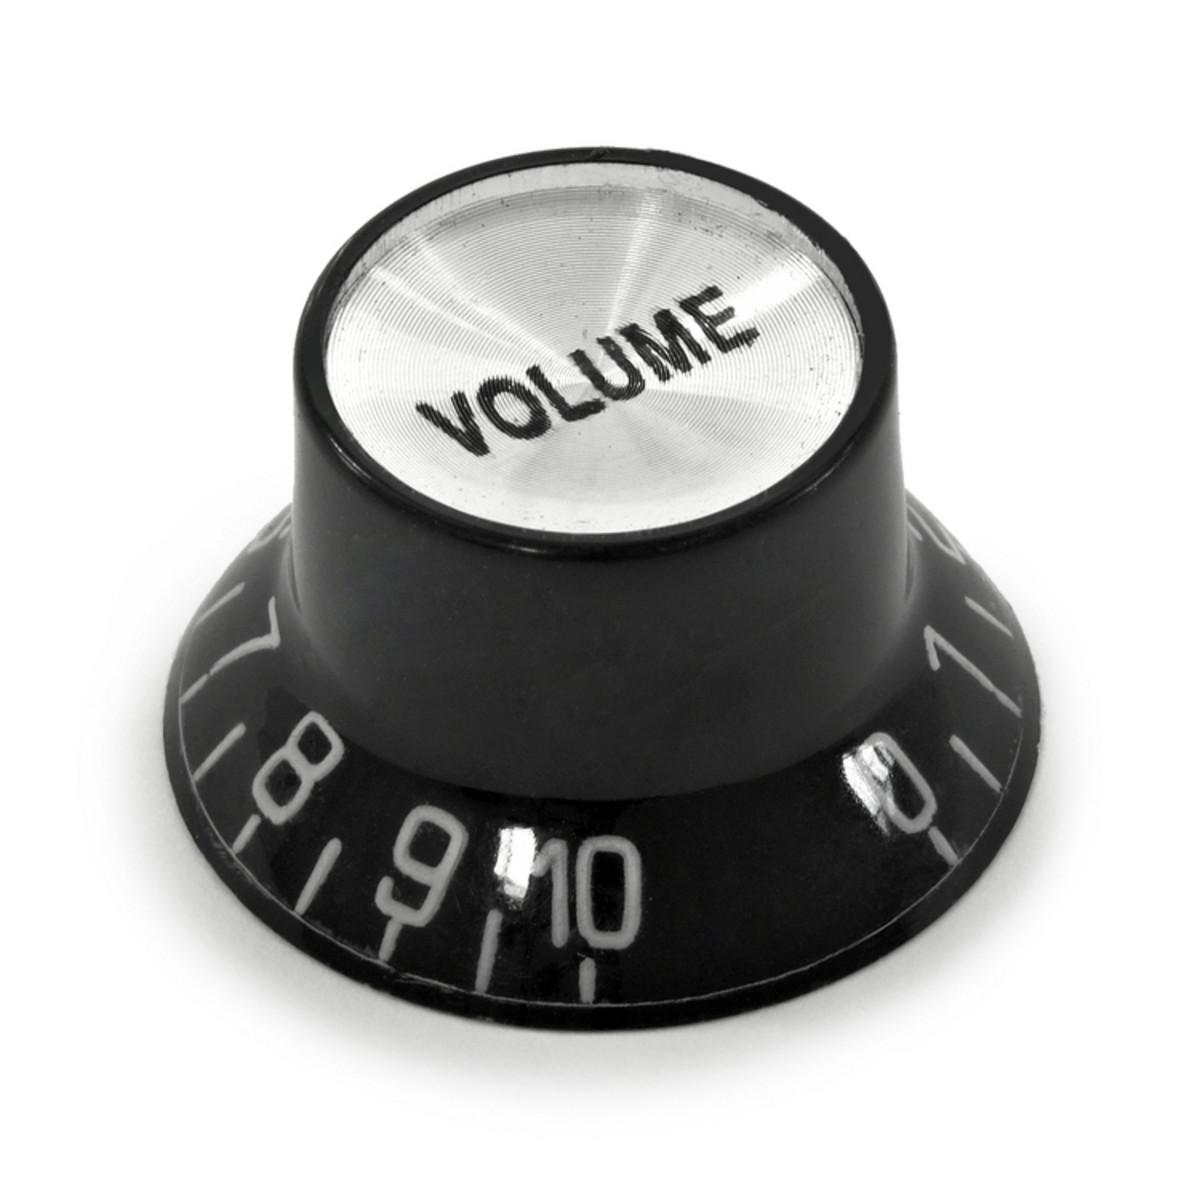 guitarworks guitar volume control knob top hat at gear4music. Black Bedroom Furniture Sets. Home Design Ideas